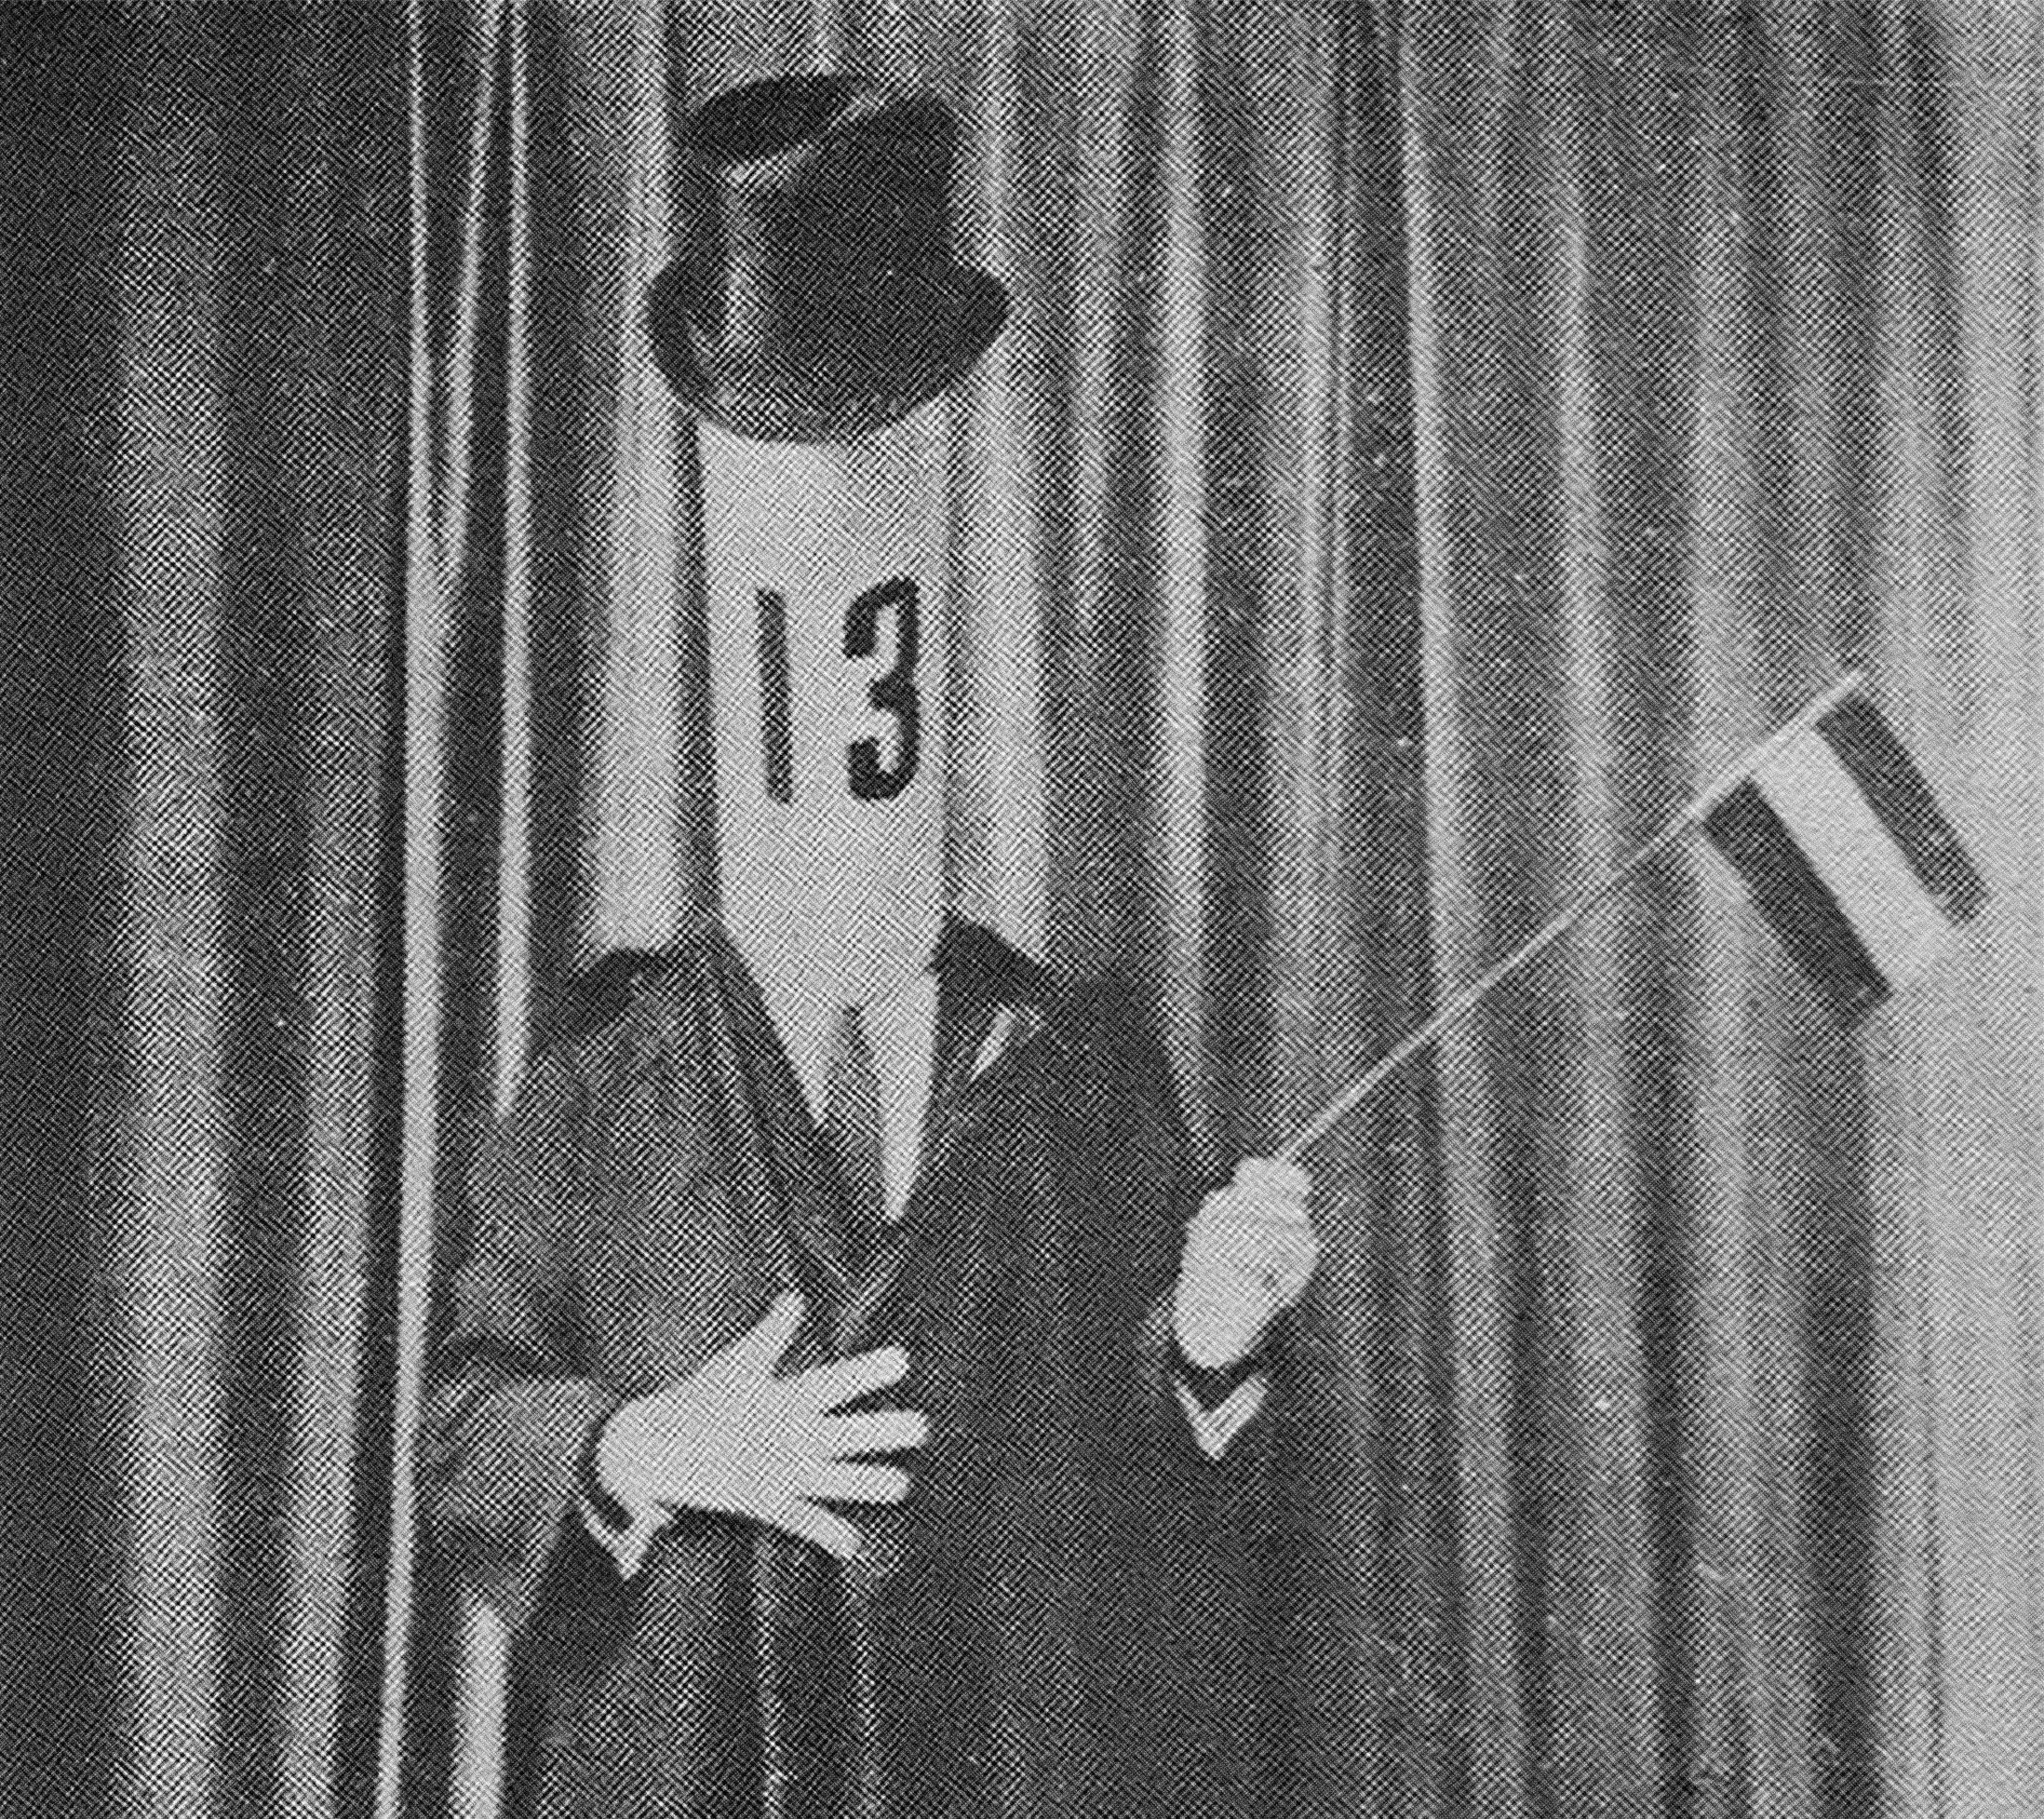 Le manifeste de monsieur antipyrine – 1916